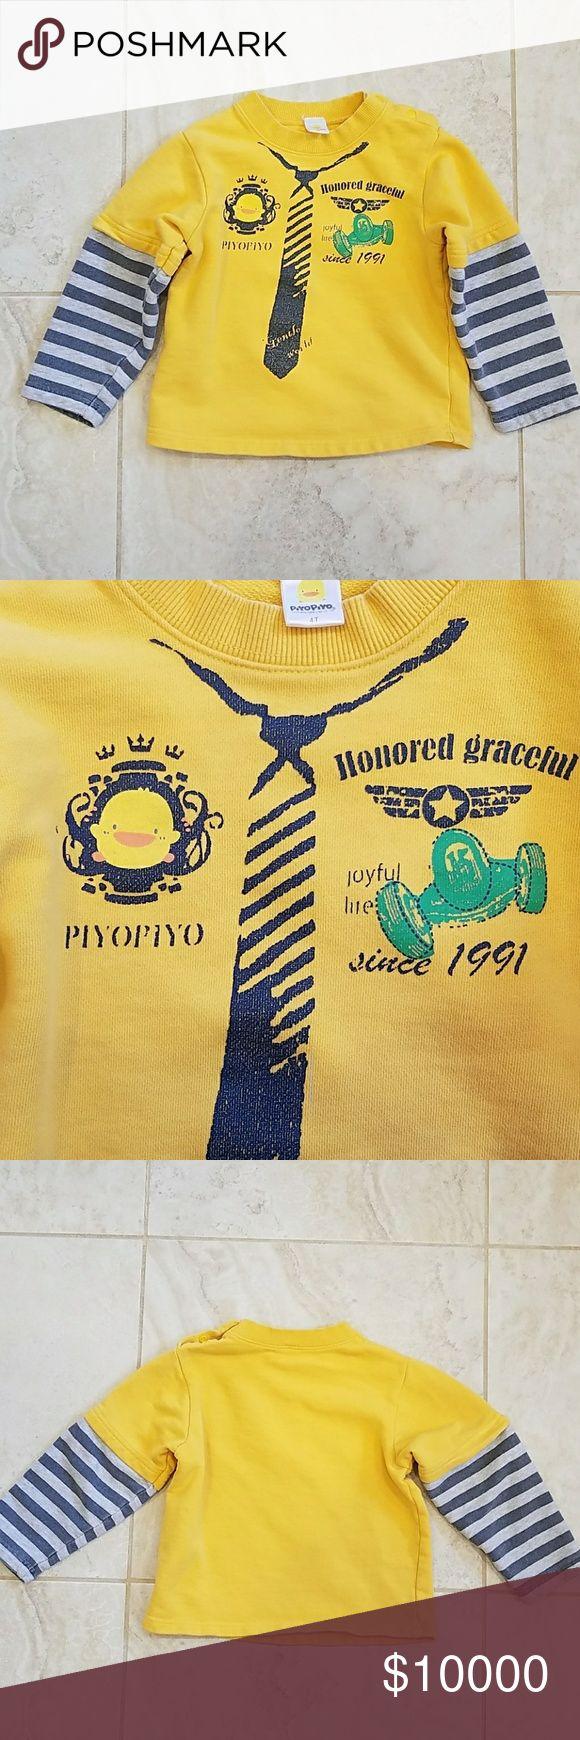 4T PIYO PIYO long sleeve shirt in warm fabric 4T PIYO PIYO long sleeve shirt. No stain or rip. It is in an excellent condition.  100% cotton. PIYO PIYO Shirts & Tops Tees - Long Sleeve